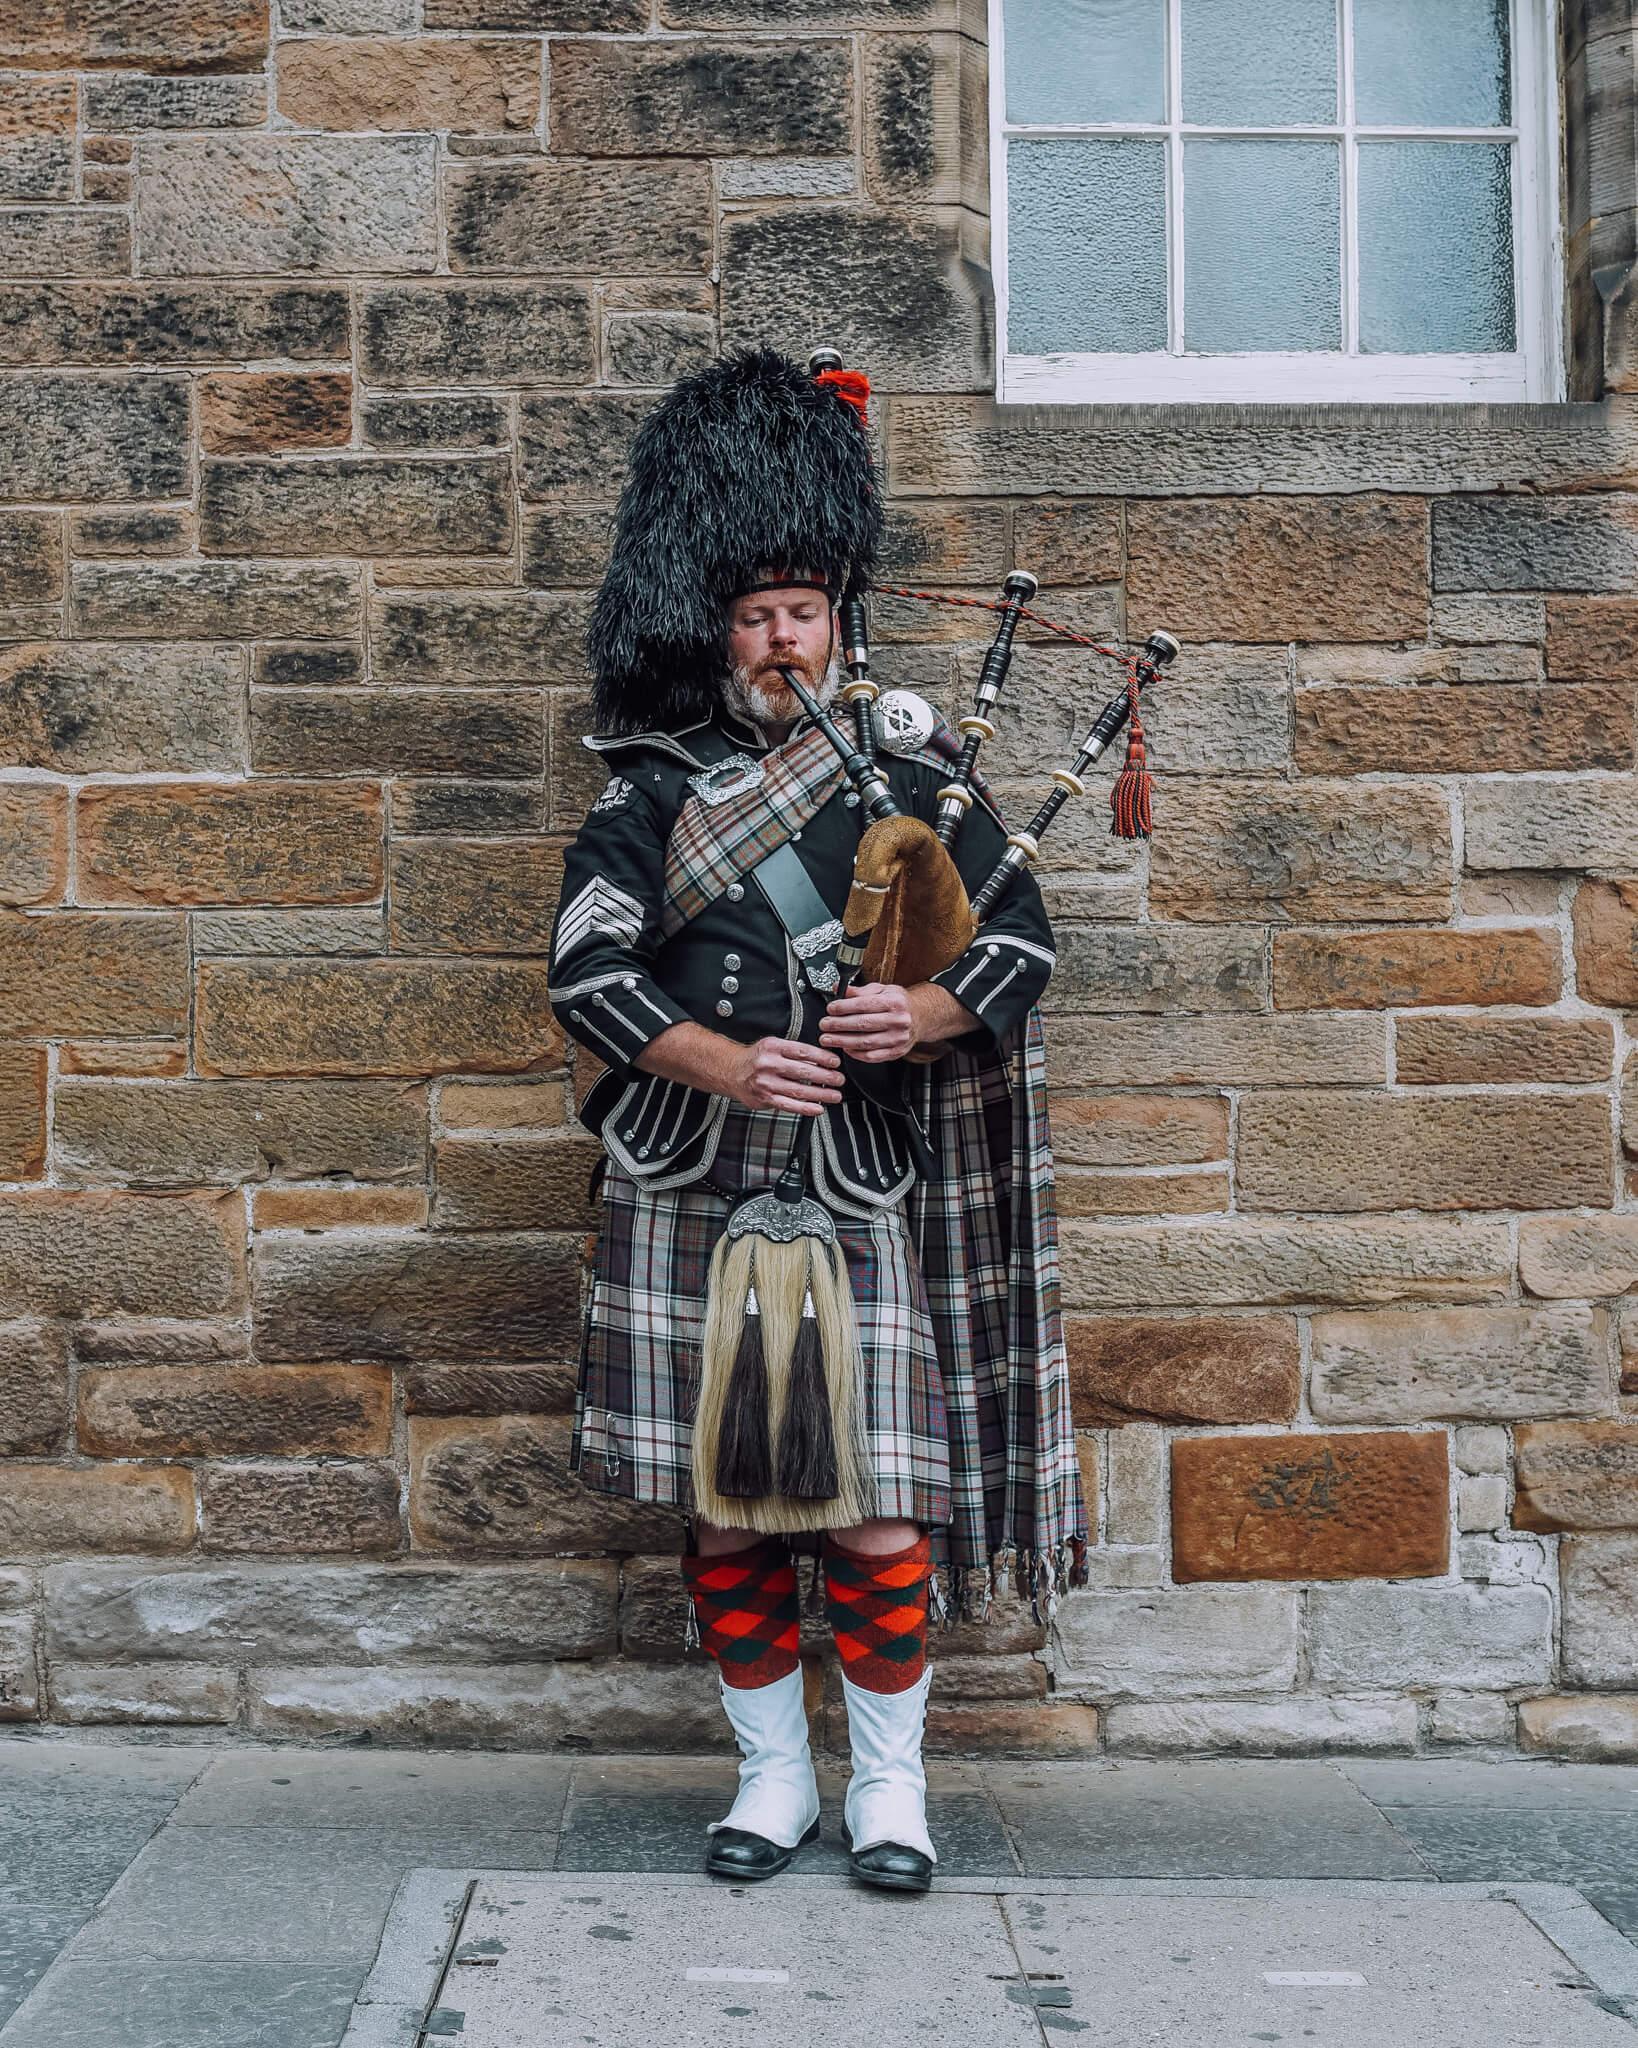 Edinburgh Men Kilt Bagpipe